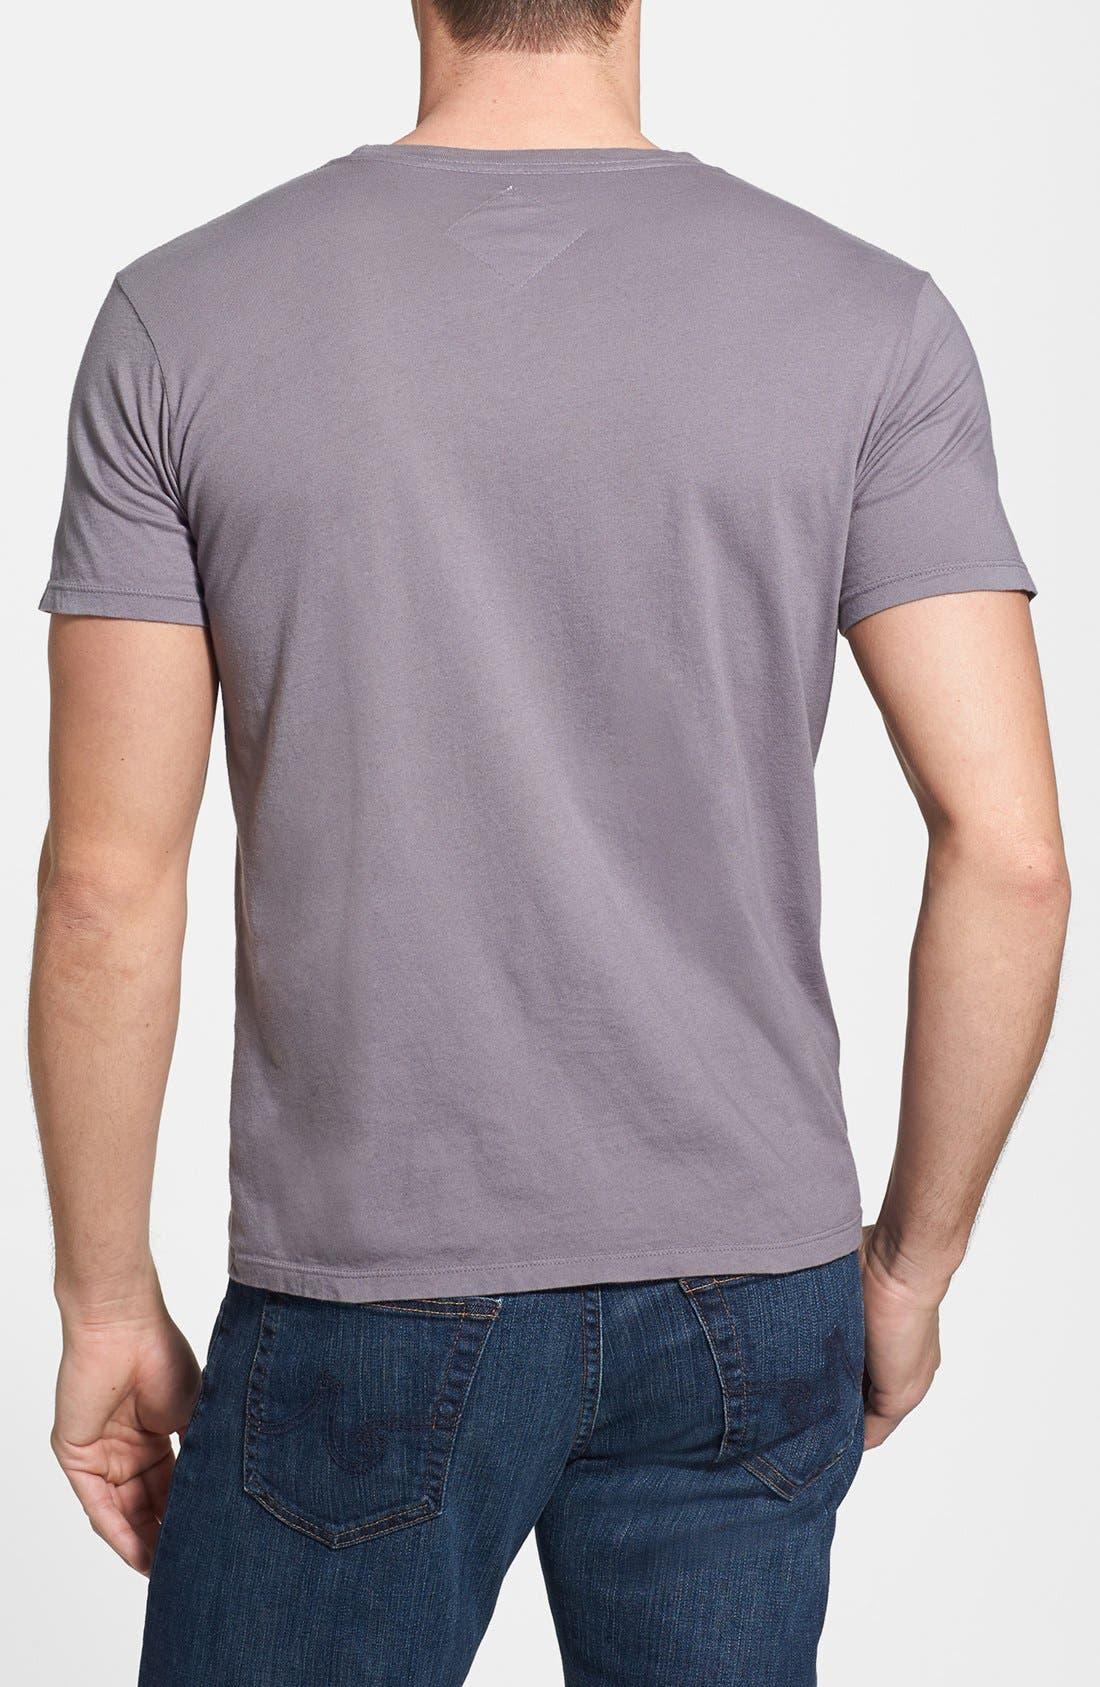 'Ace' Slim Fit T-Shirt,                             Alternate thumbnail 2, color,                             Grey